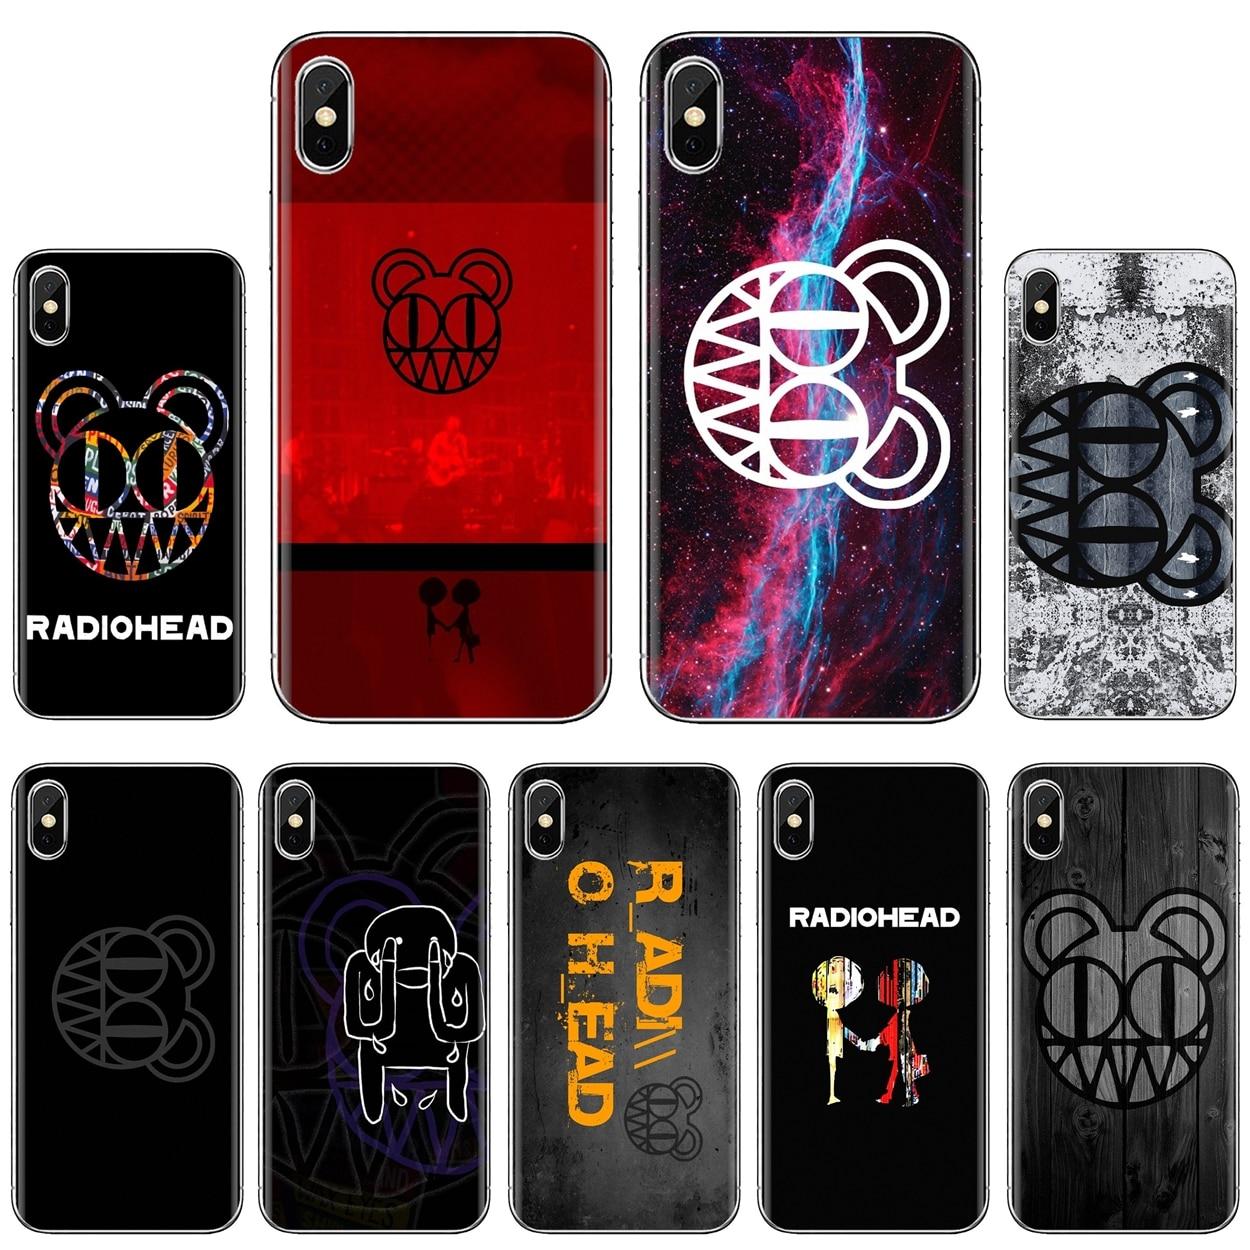 Radiohead logo British band Logo Silicone Case For Xiaomi Redmi 2 S2 3 3S 4 4A 5 5A 5 6 6A 7A 9 9T 9